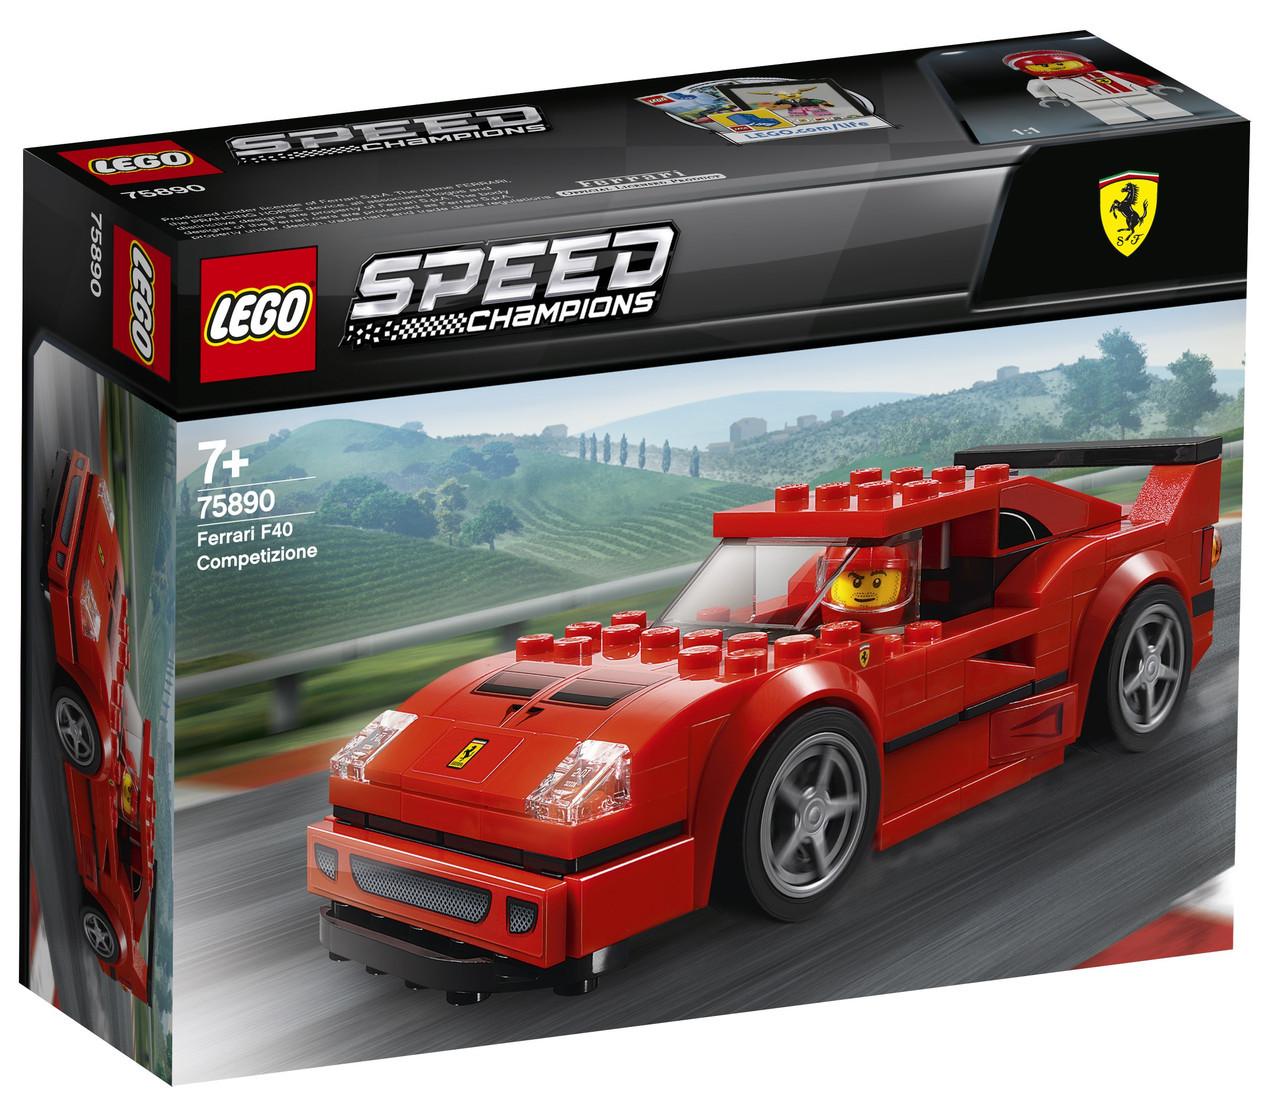 Lego Speed Champions Автомобіль Ferrari F40 Competizione 75890